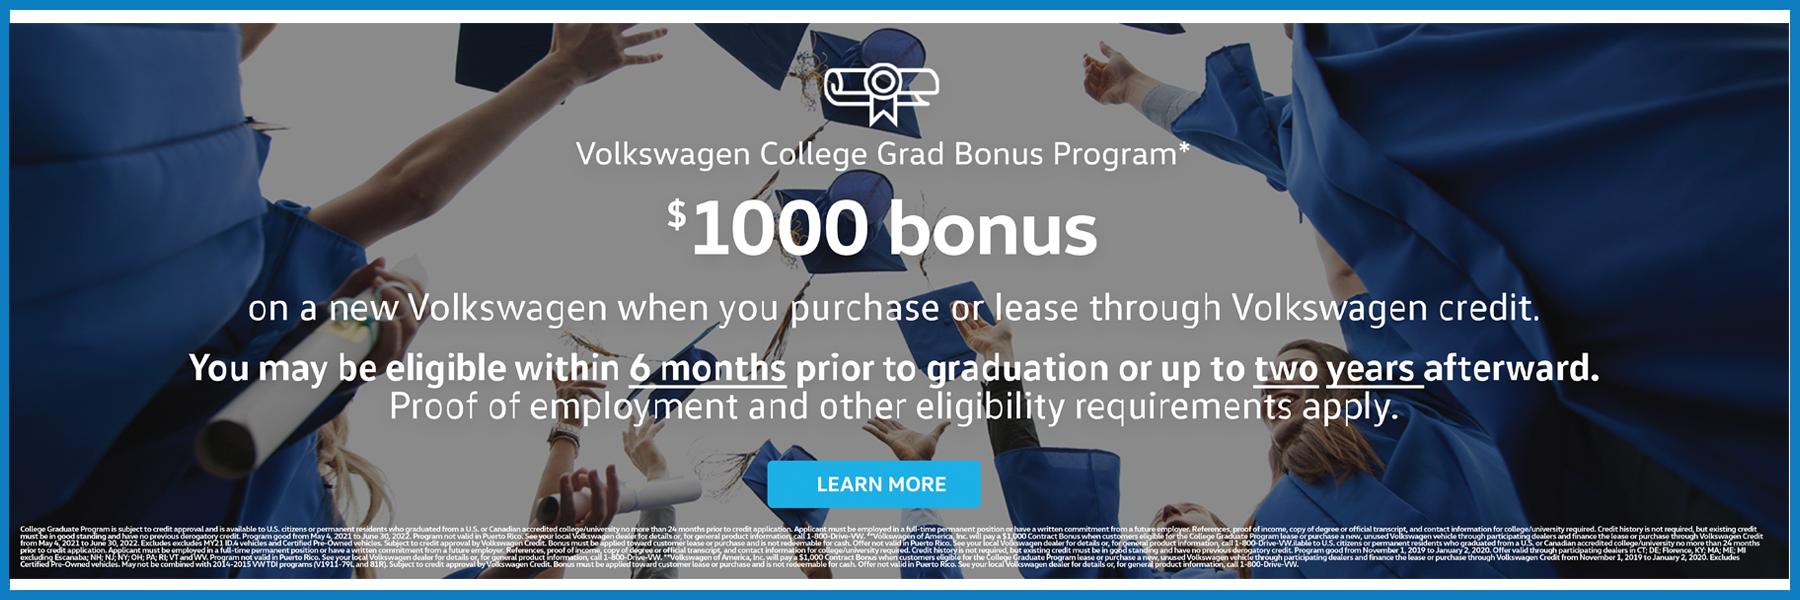 $1,000 Volkswagen College Bonus Offer Web Slide